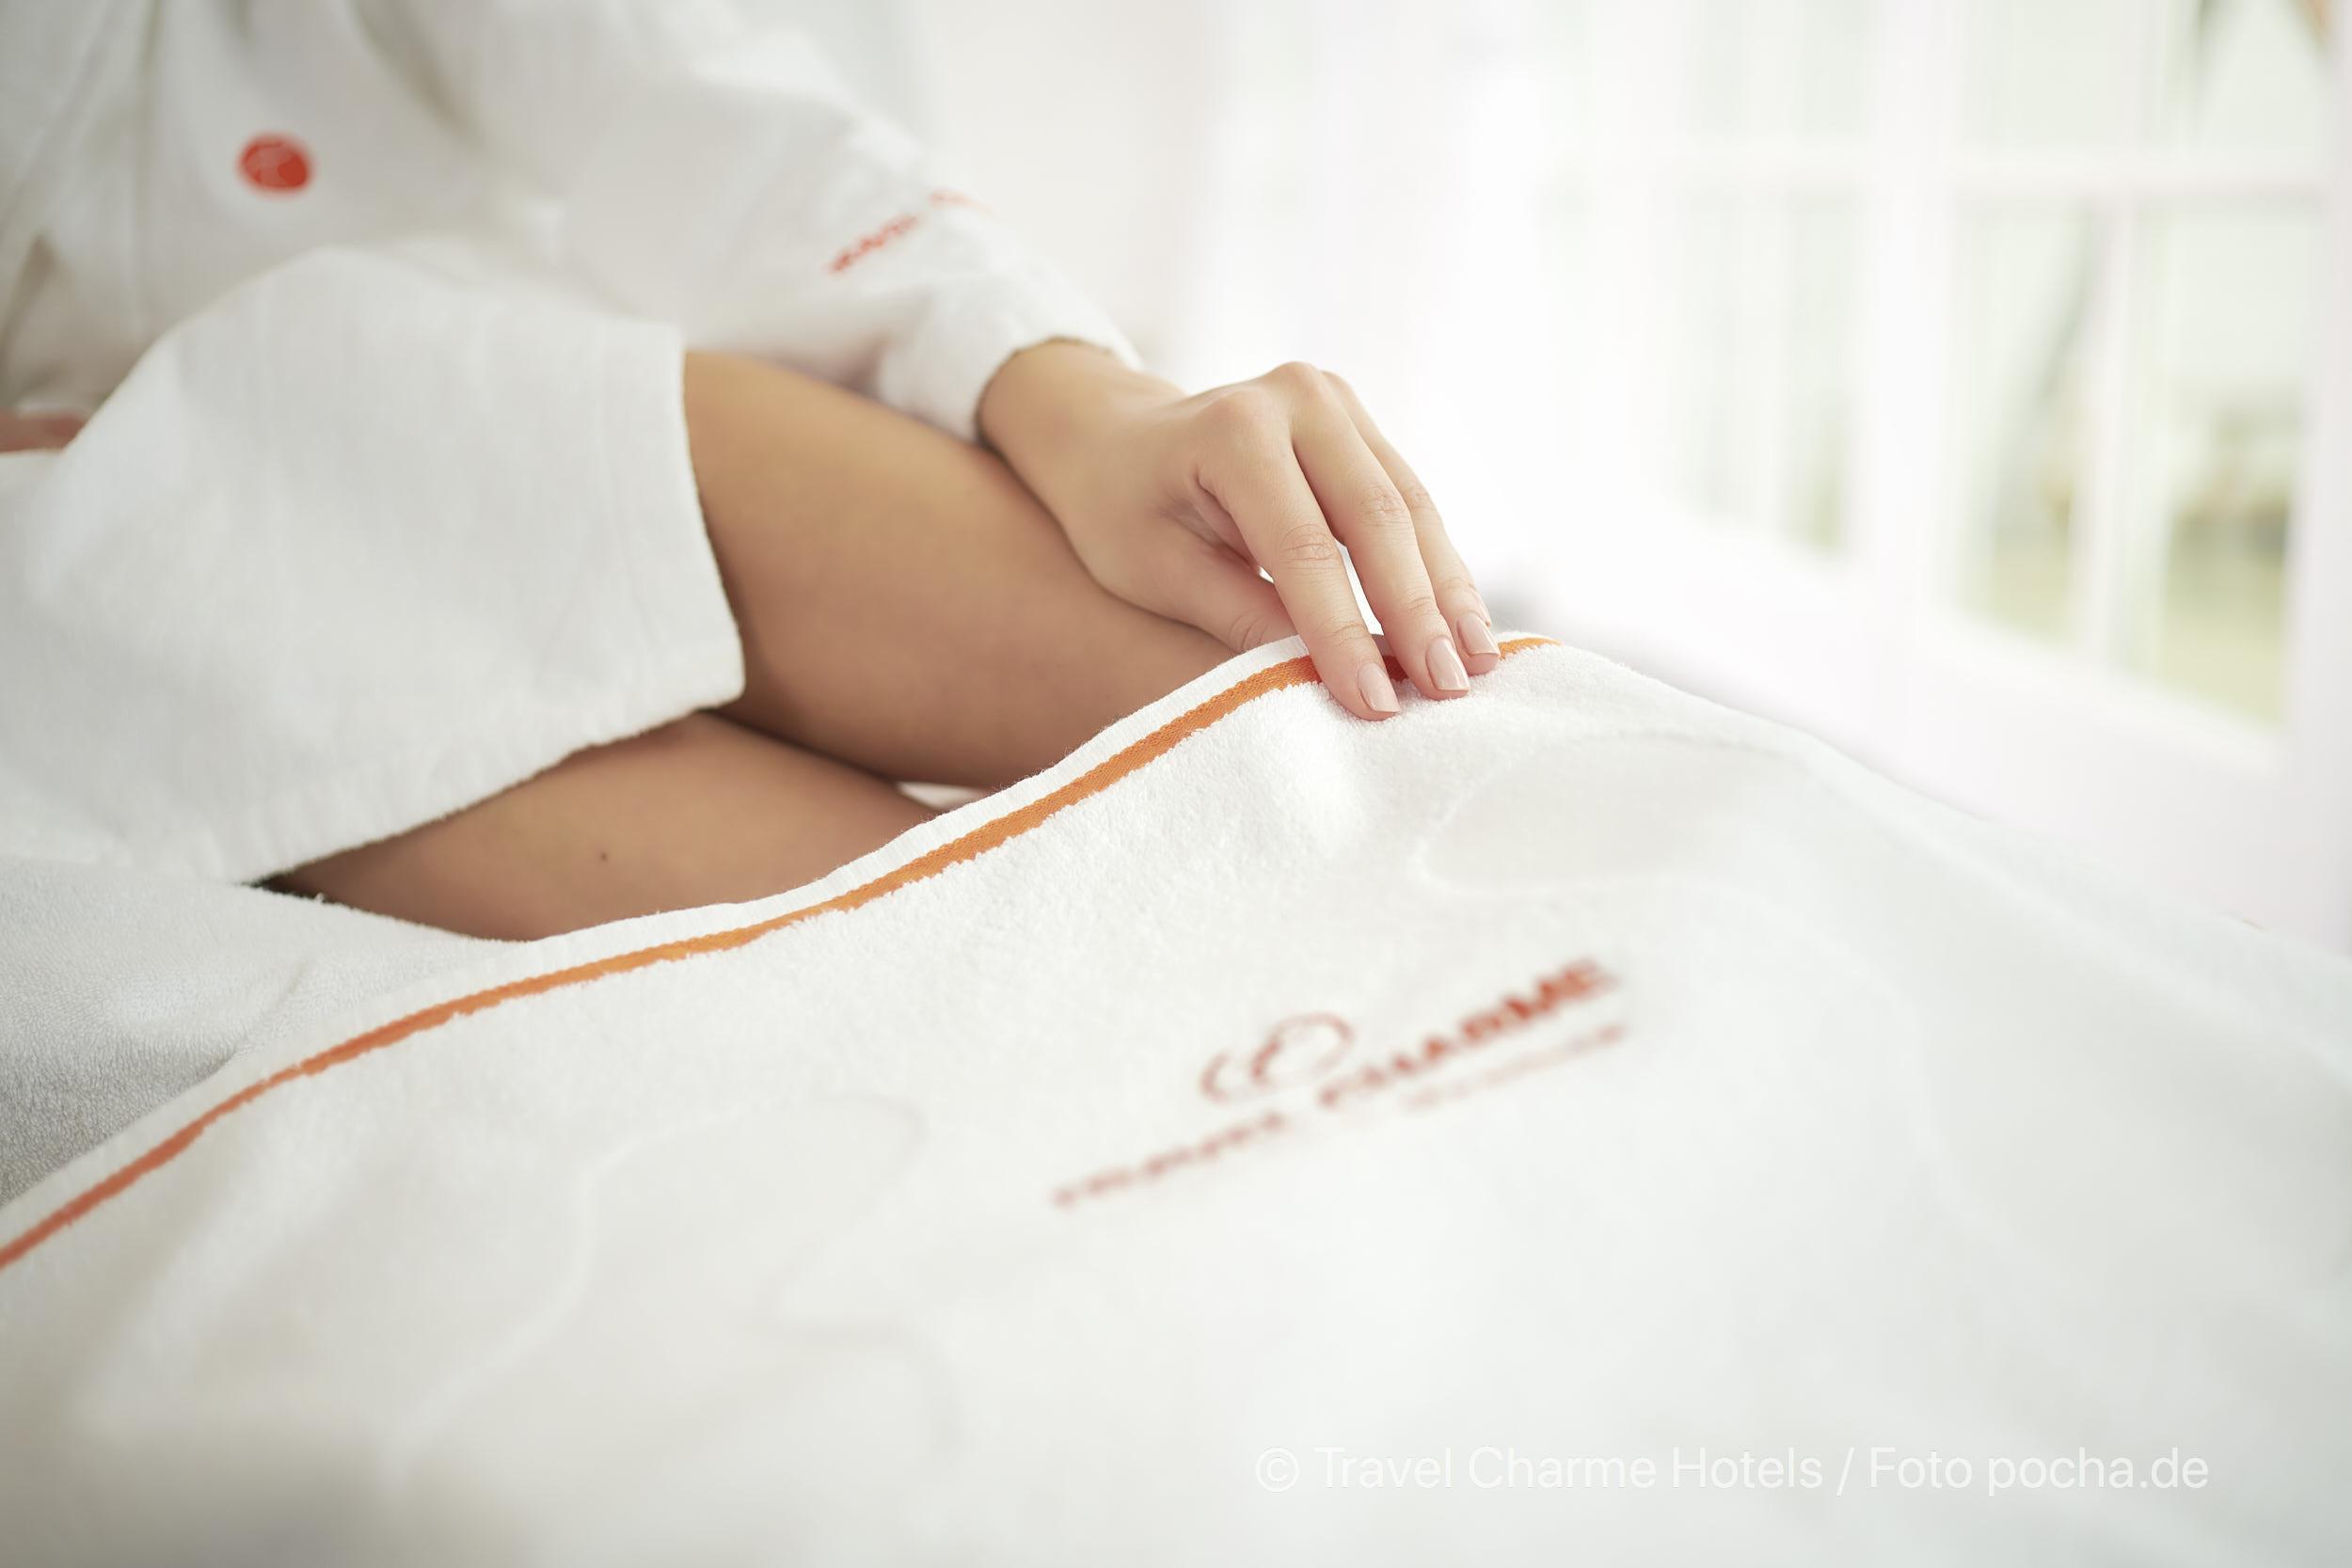 Liesa Wellness Komfort Handtuch Produkt Photoshooting mit Model